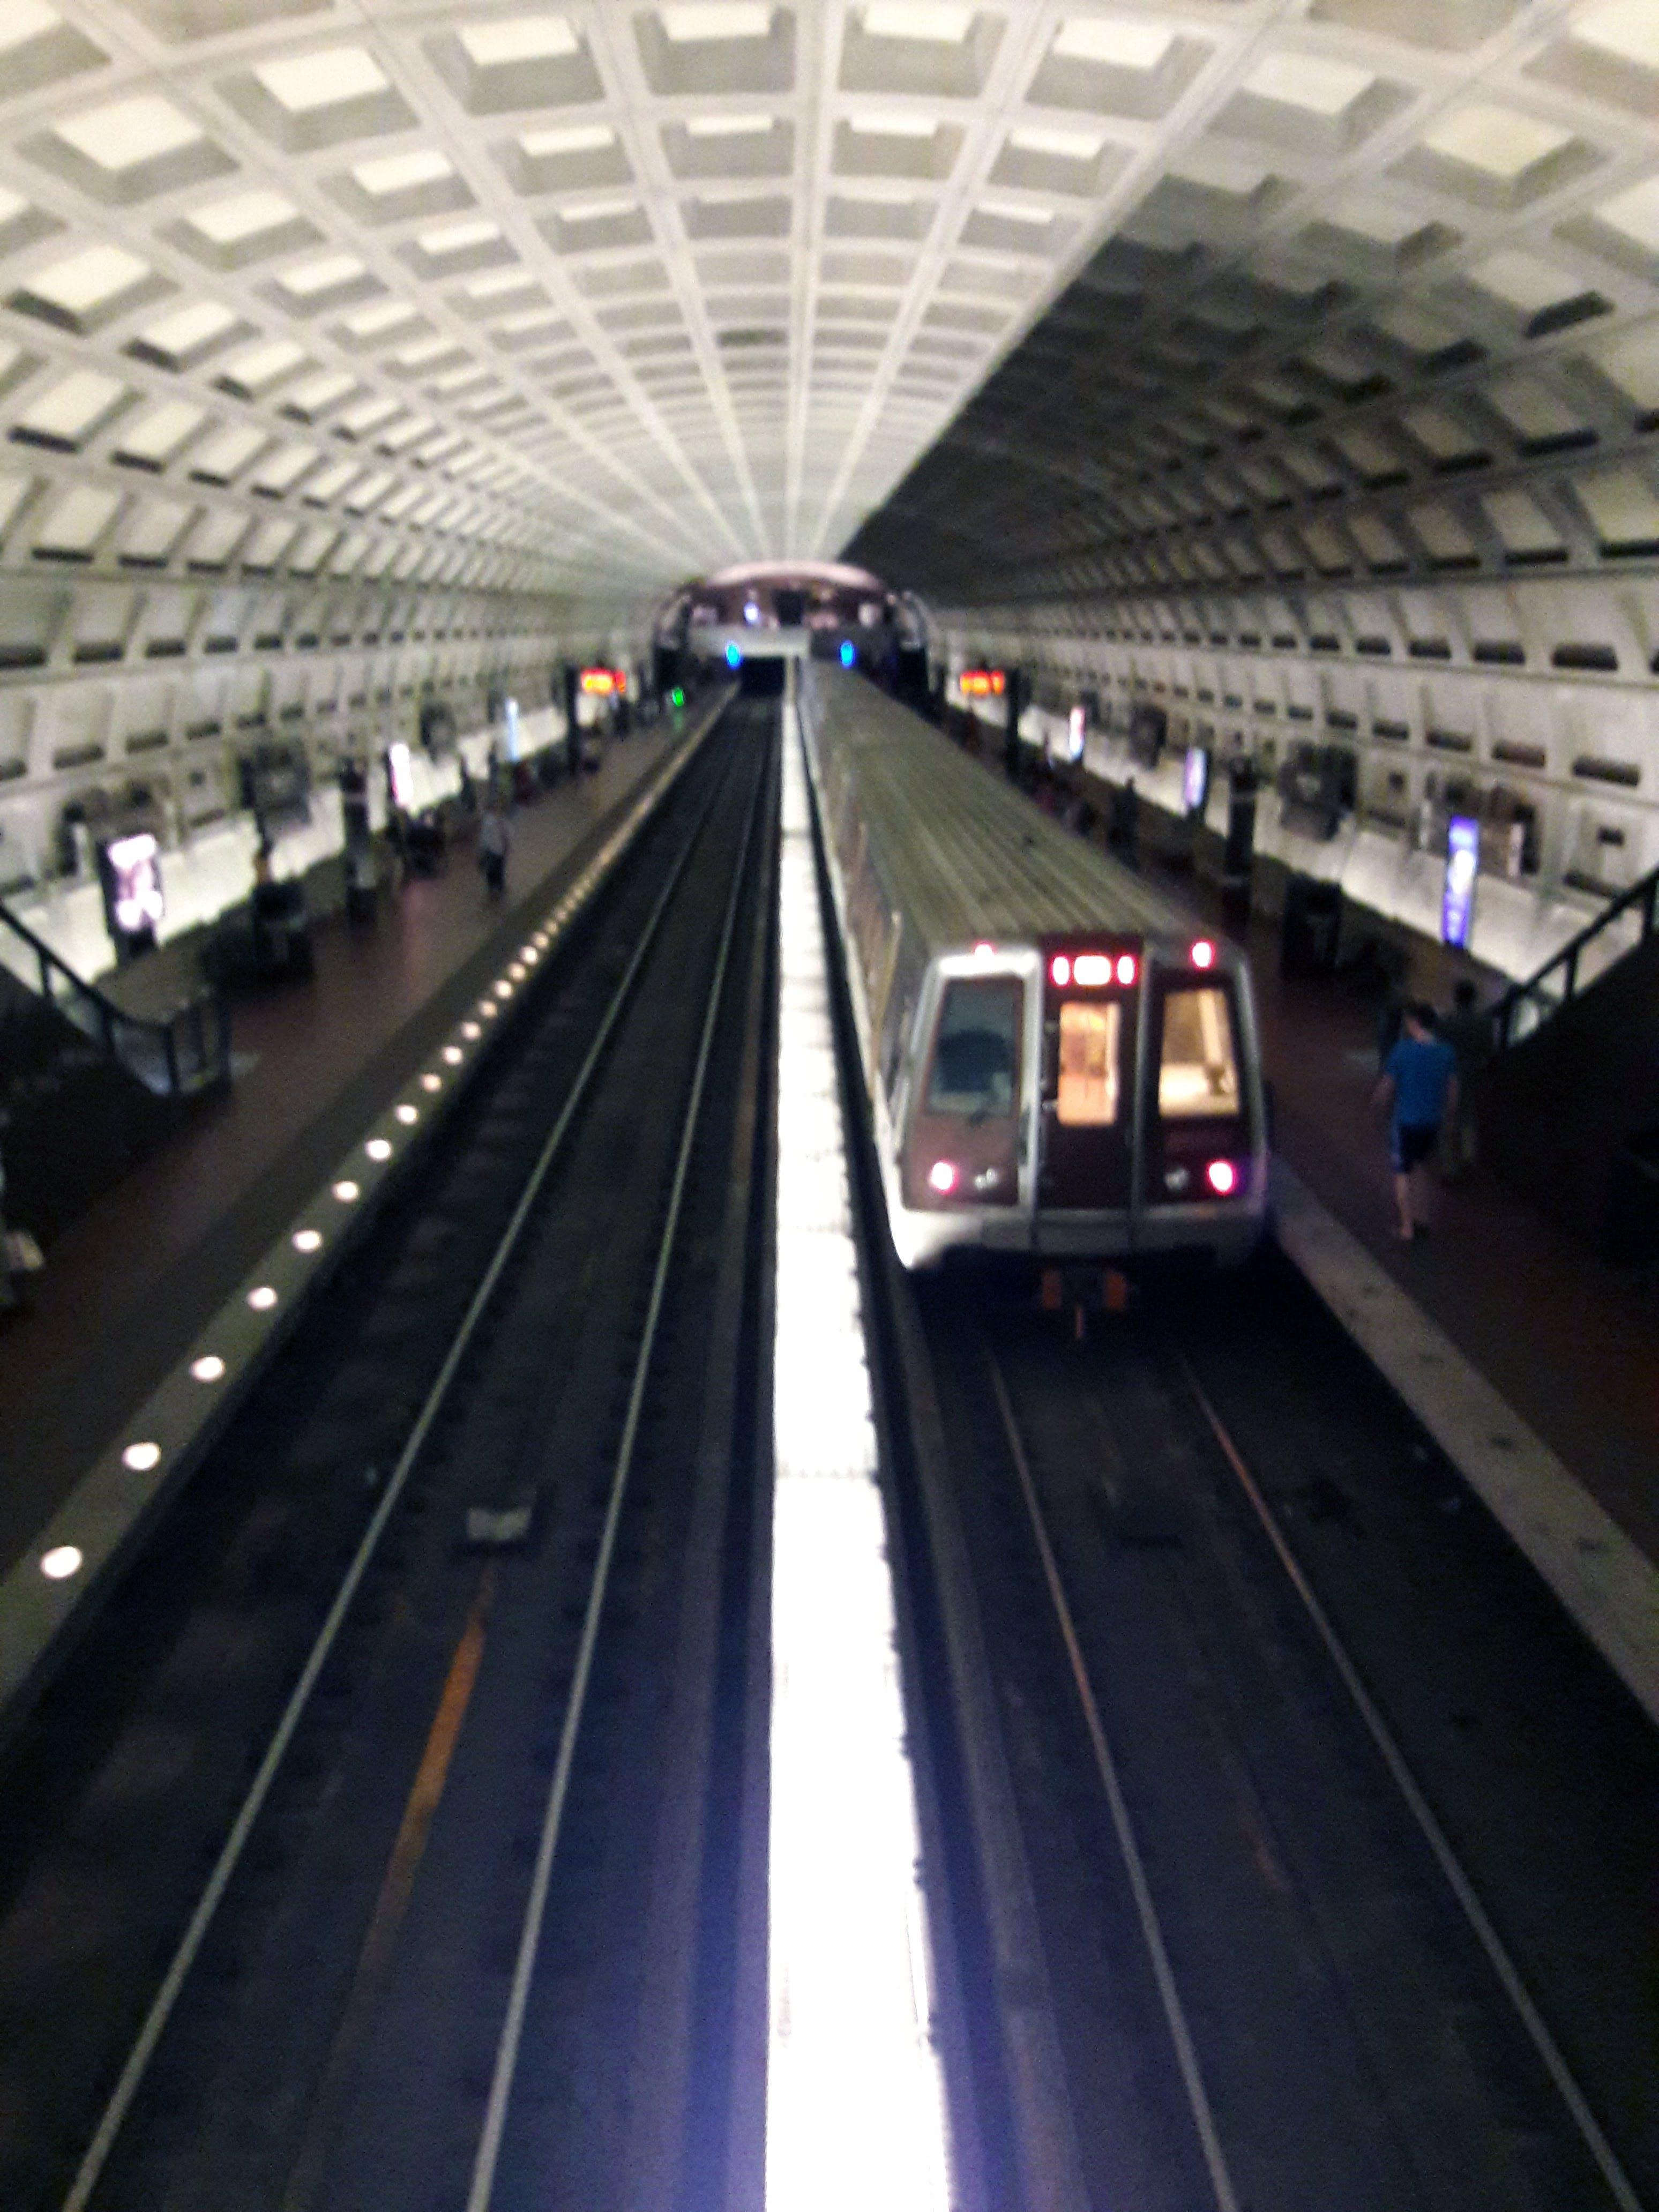 Free stock photo of metro, public transportation, train station, washington